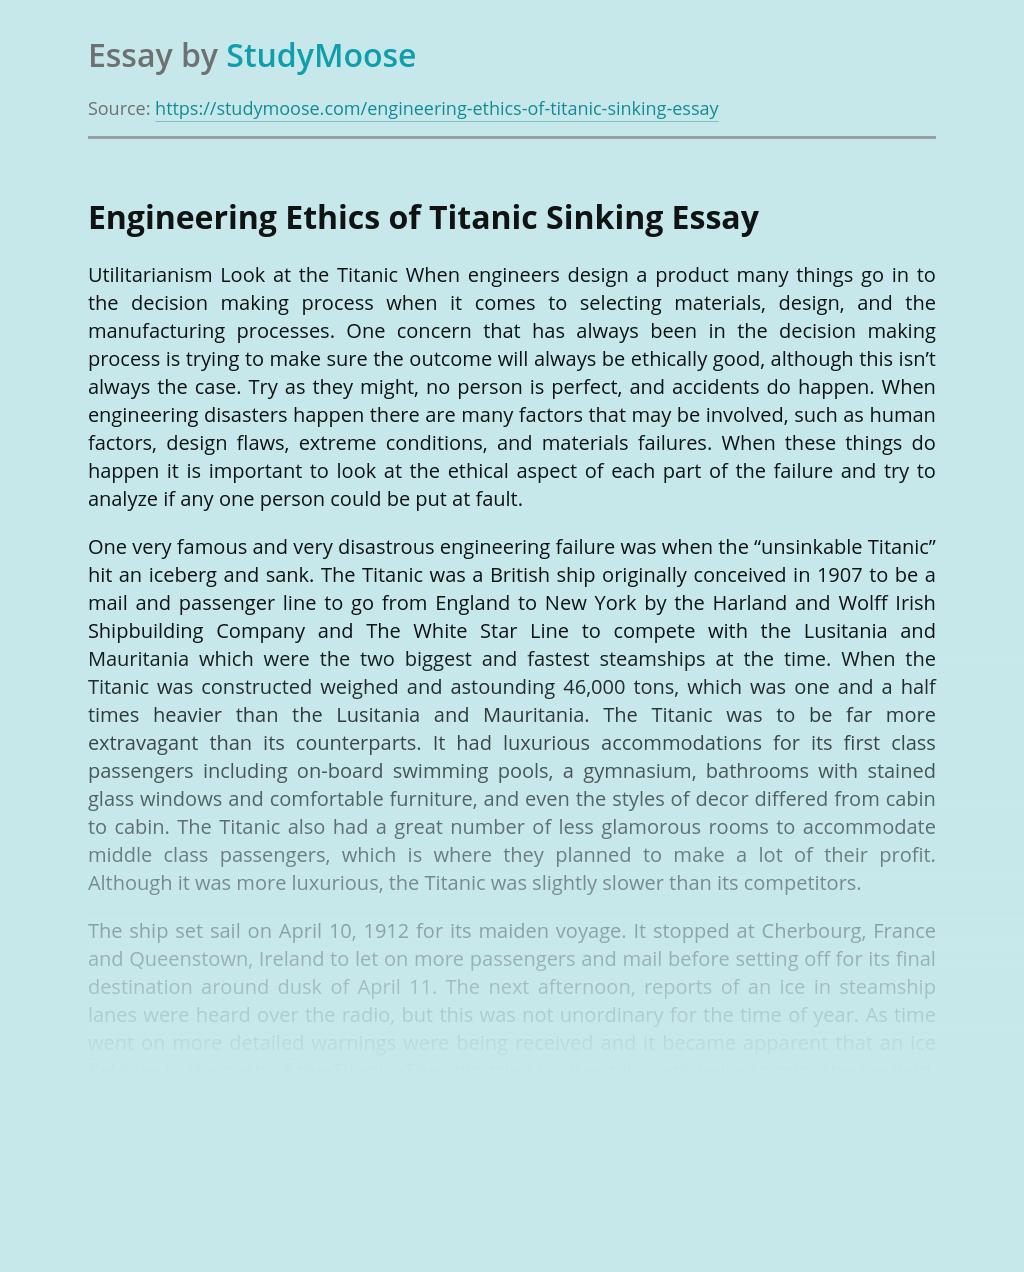 Engineering Ethics of Titanic Sinking